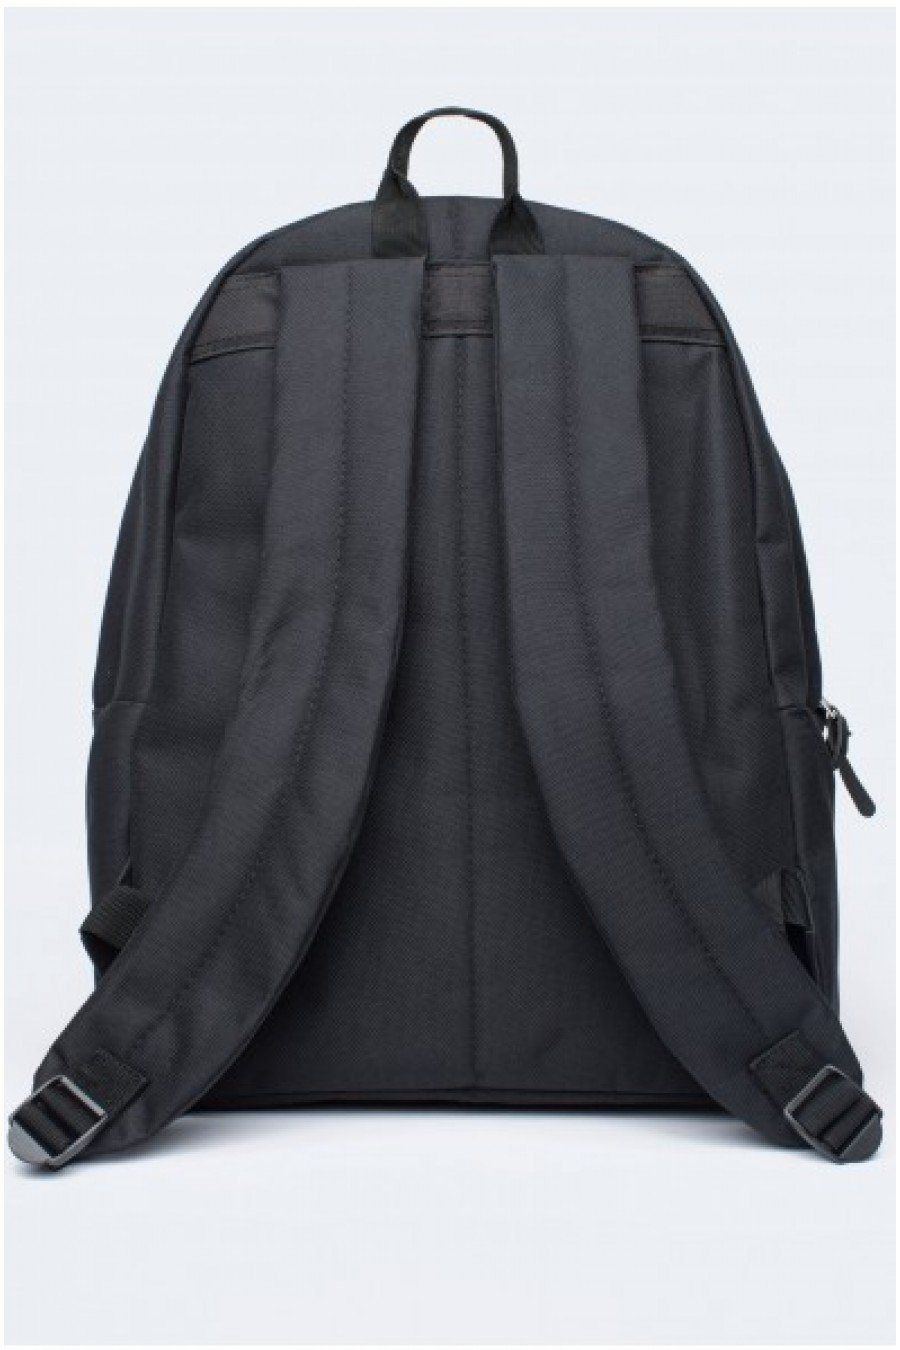 HYPE Black Badge Backpack